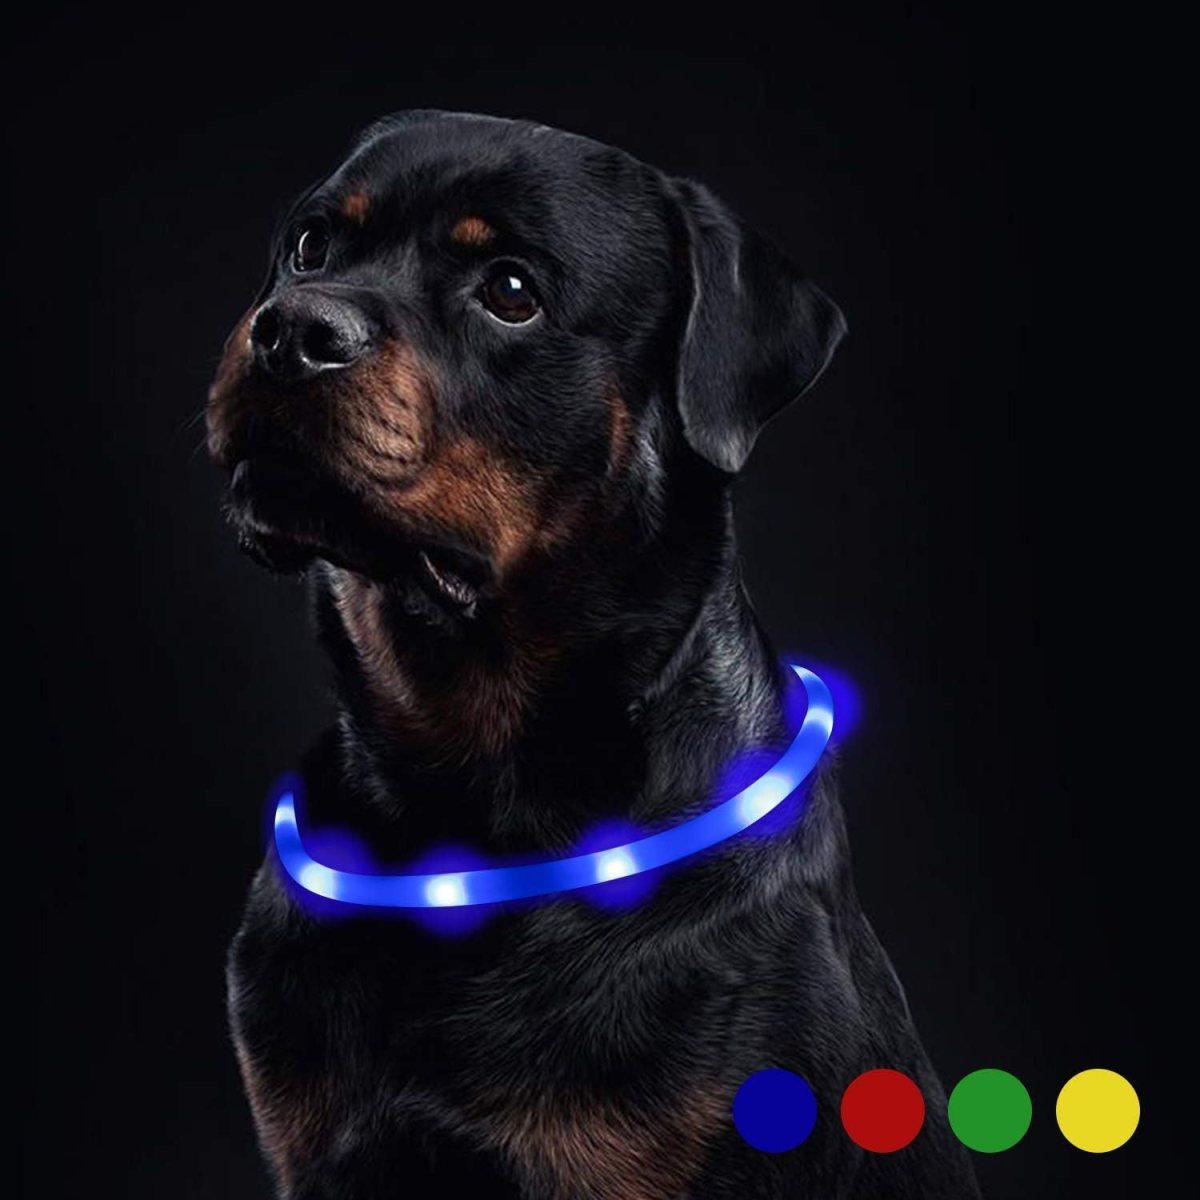 Toozey Luminoso Collares para Perro LED Durante 20 Horas de Luz Continua Impermeable